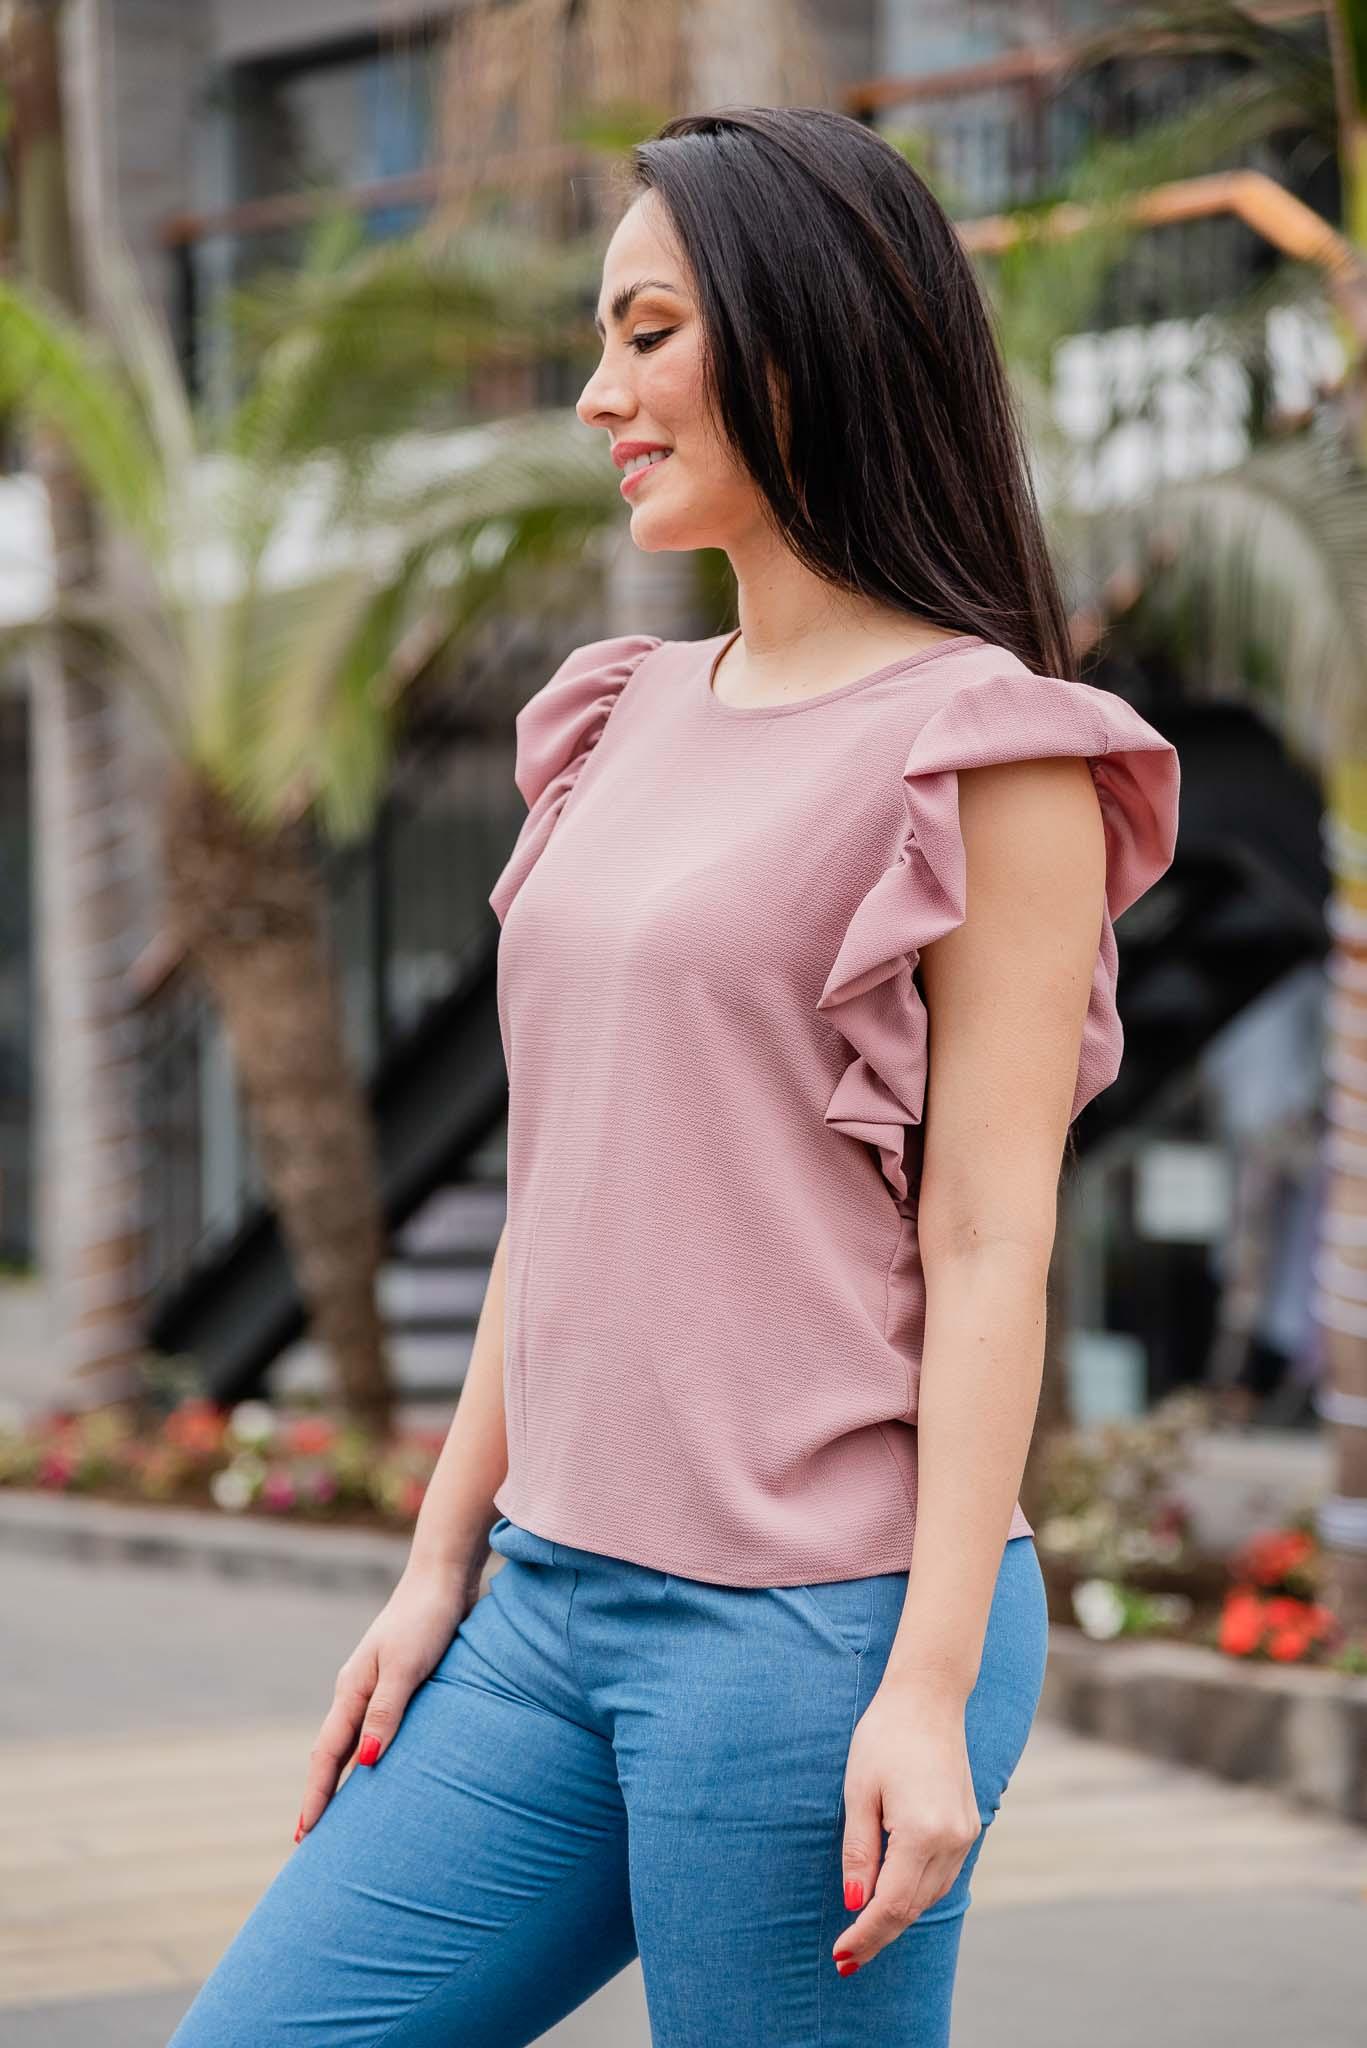 Blusa cuello redondo con bobo en lamanga  Disponible en talla S M L  La modelo usa la talla S